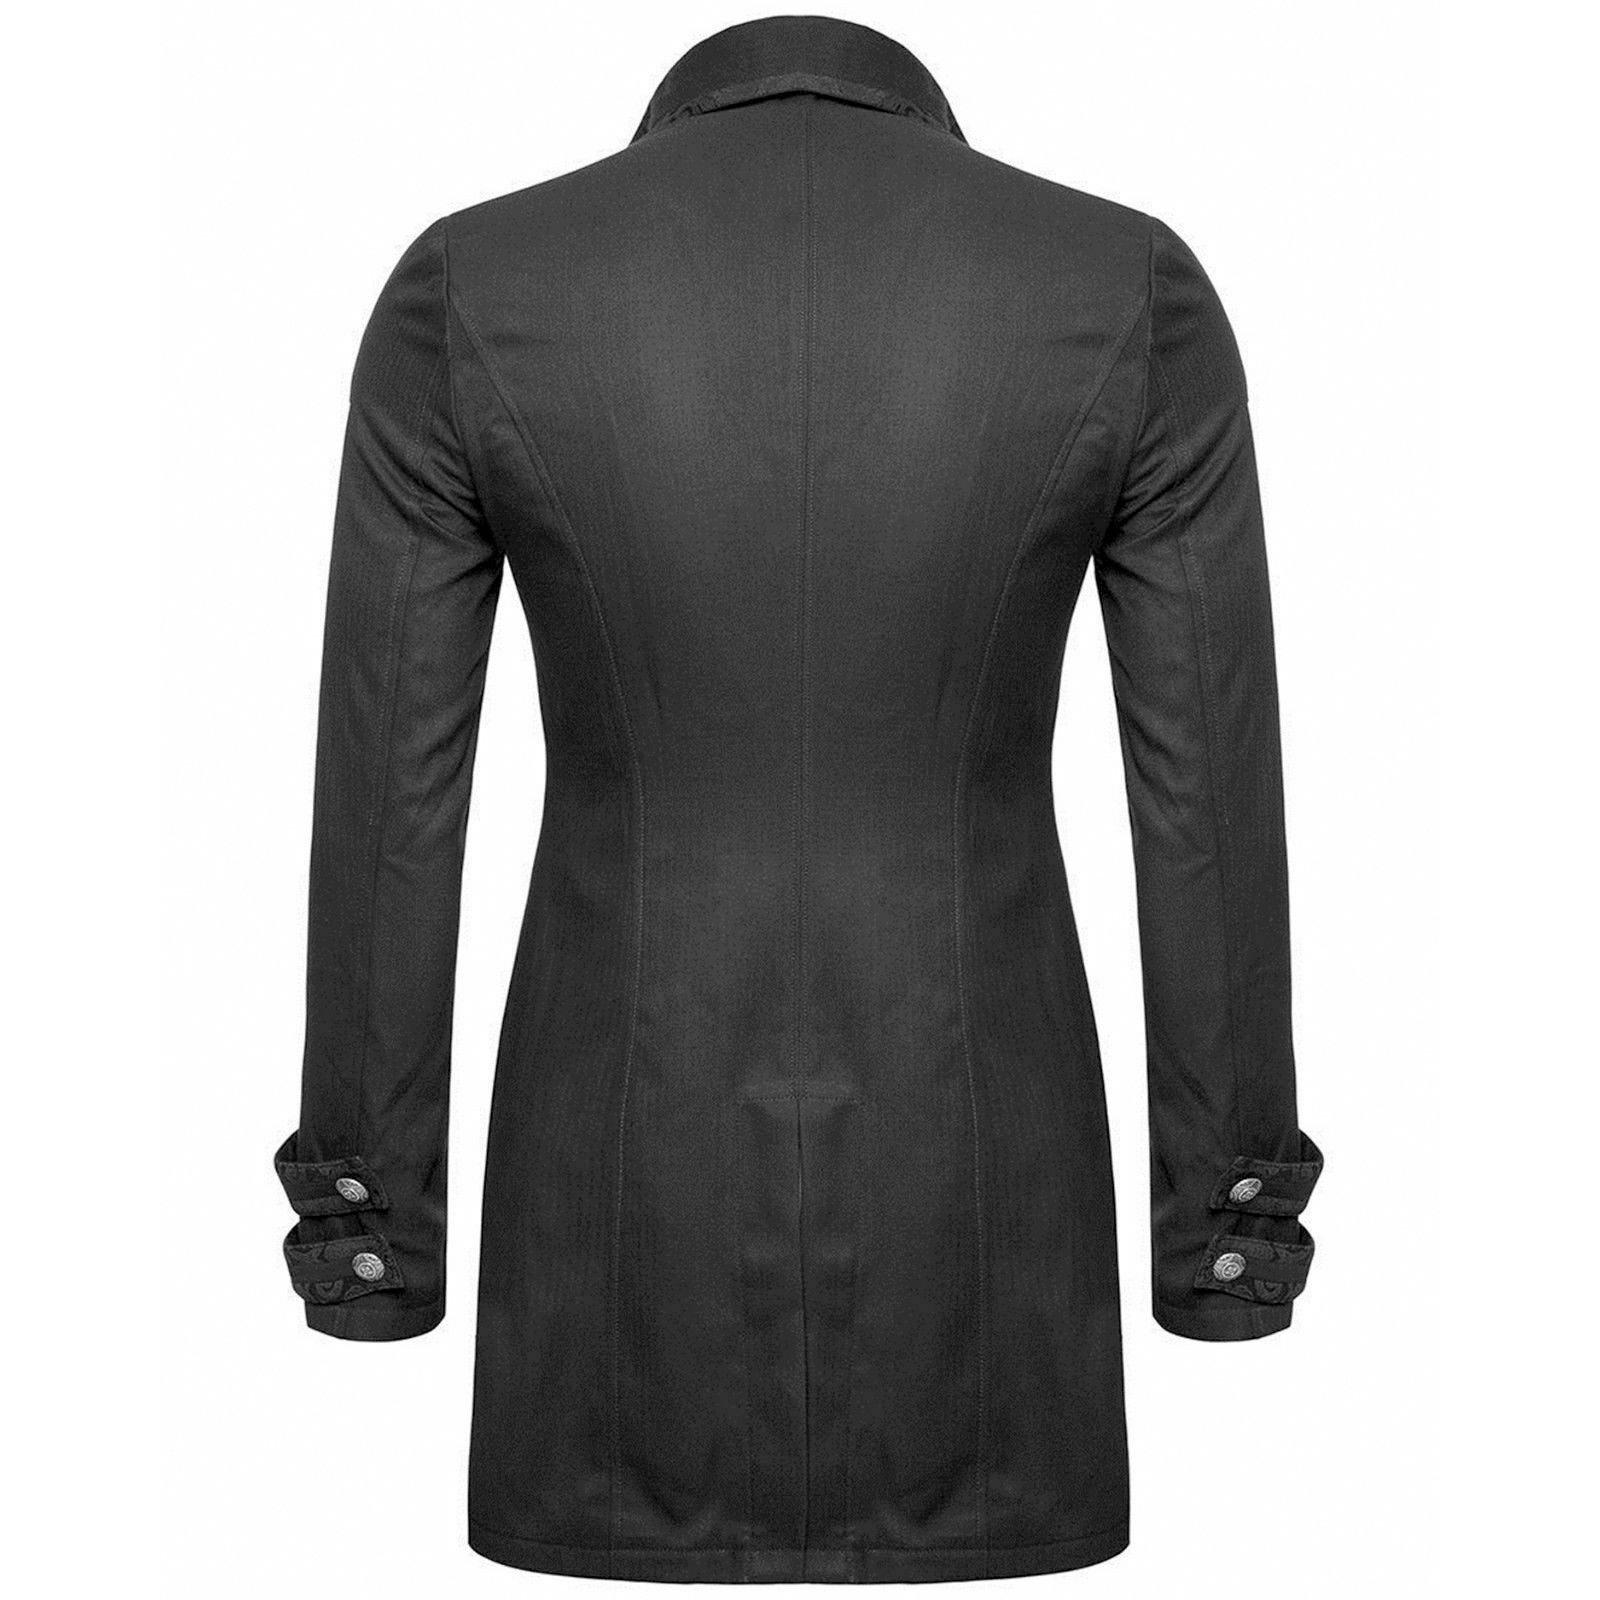 Darkrock Men's Morning Gothic Jacket Tailcoat Black Brocade Steampunk Victorian (2)